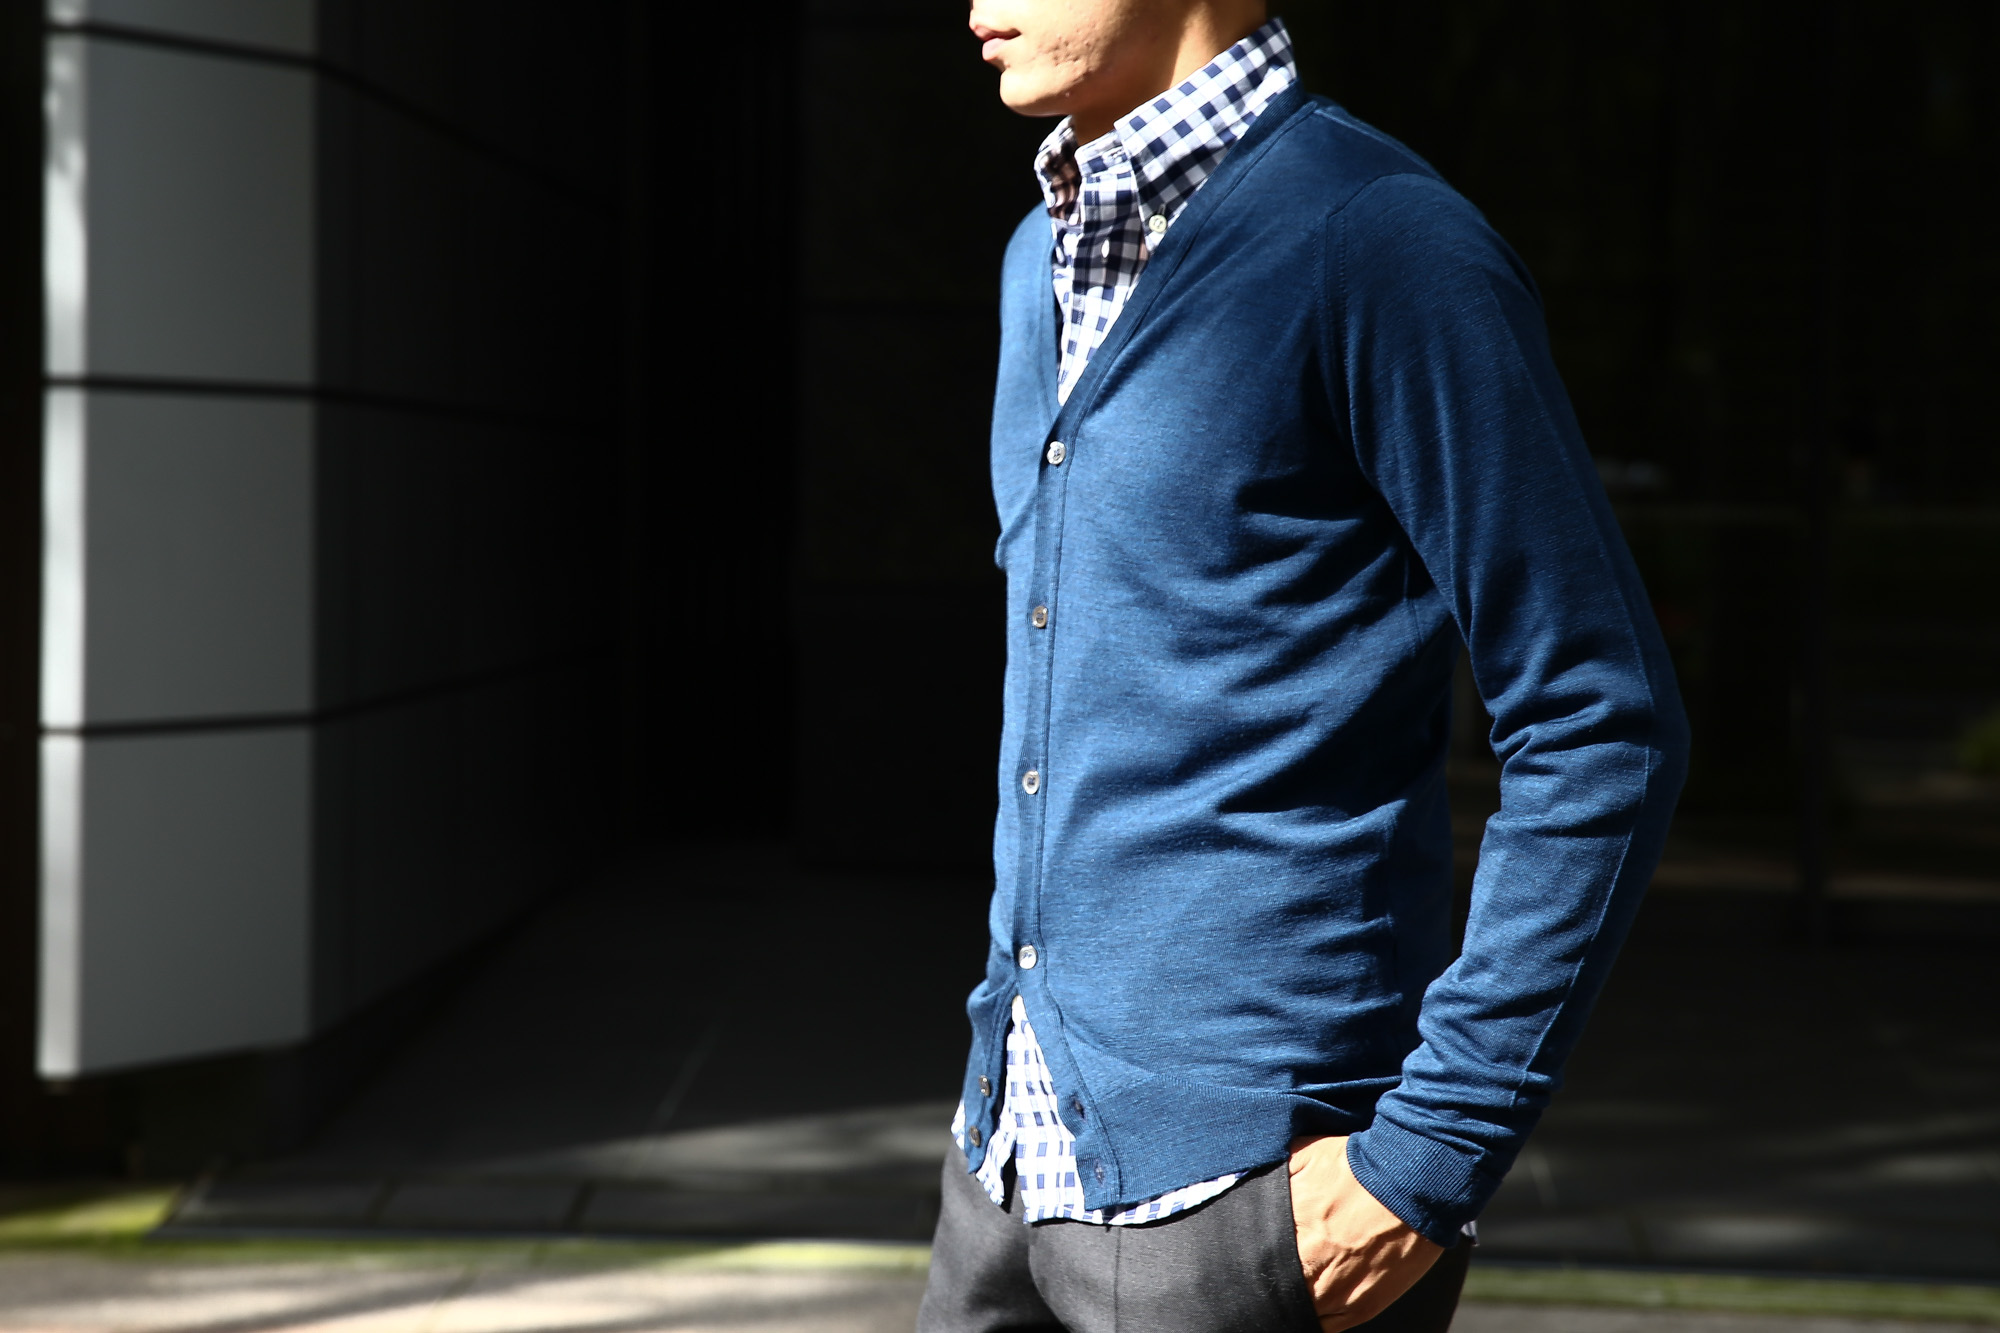 JOHN SMEDLEY (ジョンスメドレー) BRYN V-NECK CARDIGAN EASY FIT メリノウール100% ハイゲージニット Vネックカーディガン INDIGO (インディゴ) MADE IN GREAT BRITAIN(イギリス製) 2016 秋冬新作 のコーディネート画像。 XS,S,M,L 愛知 名古屋 ZODIAC ゾディアック スメドレー ジョンストン